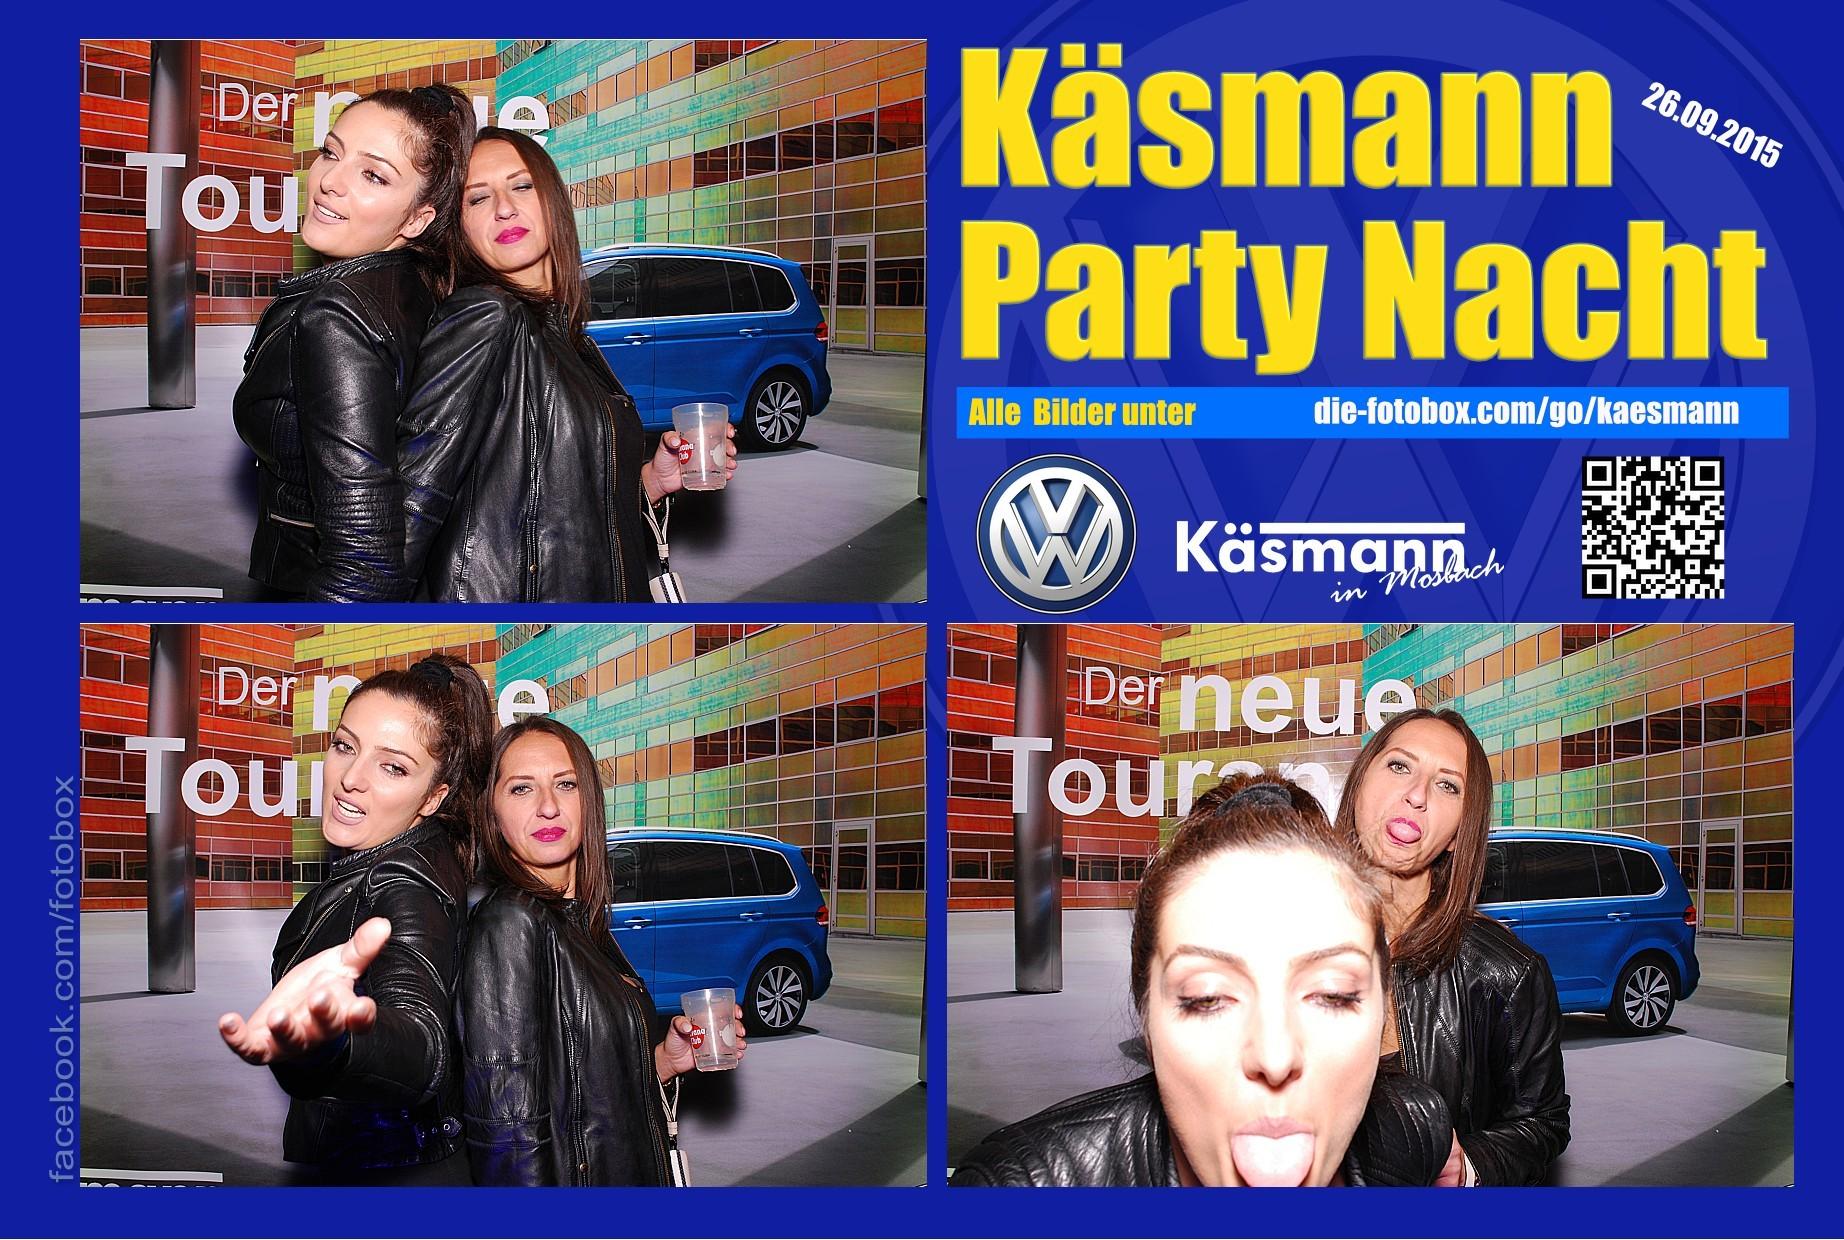 Käsmannparty 2015 - www.die-fotobox.com 01092